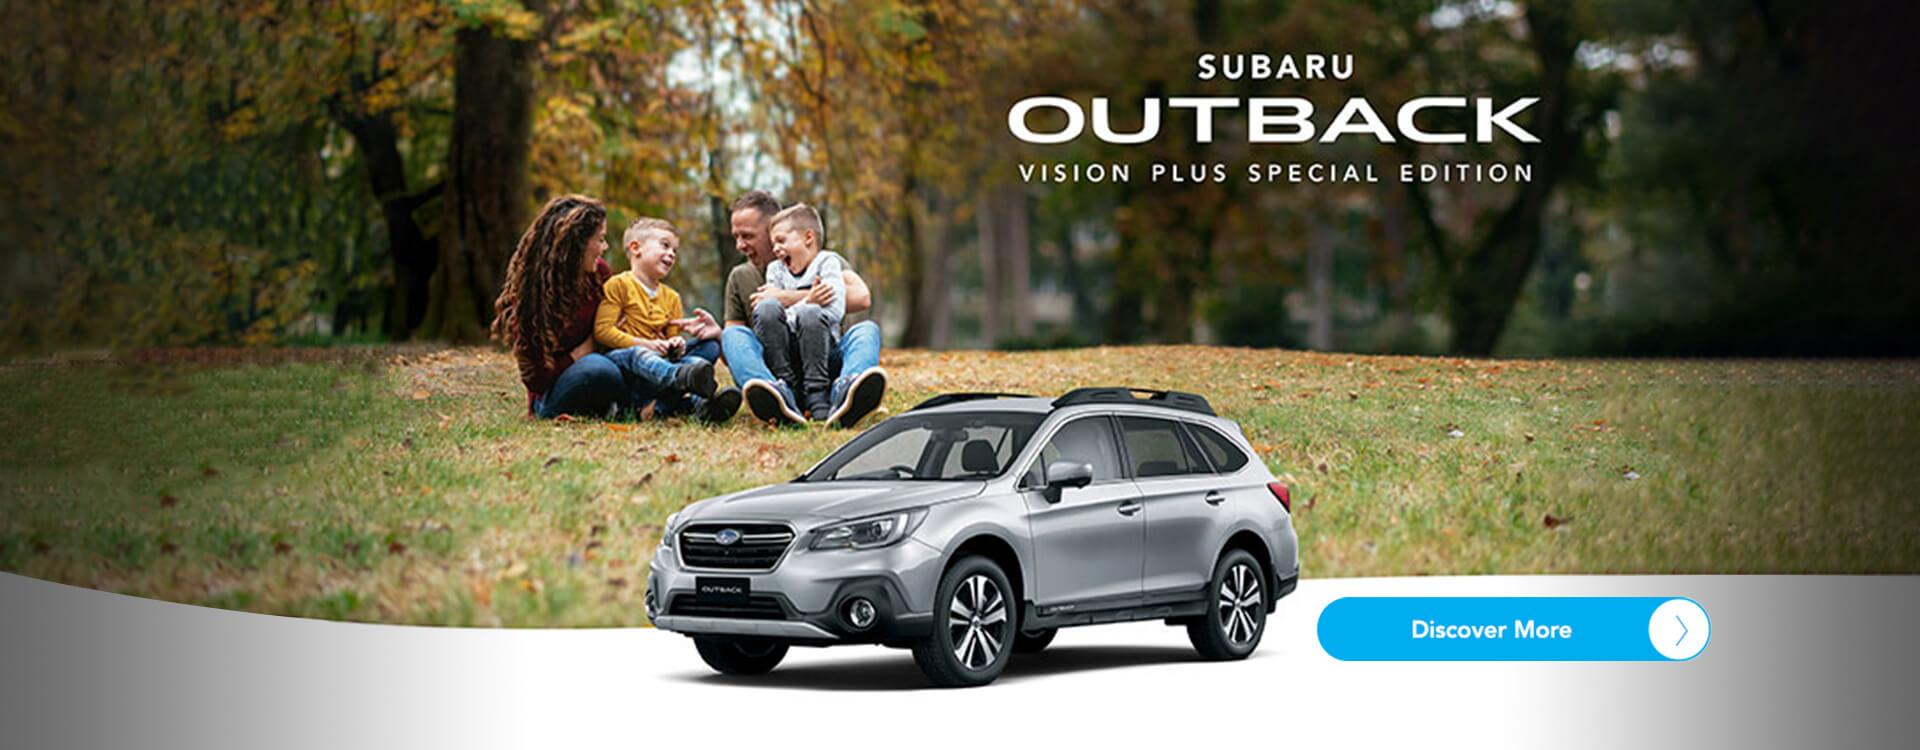 Subaru Outback Vision Plus Special Edition